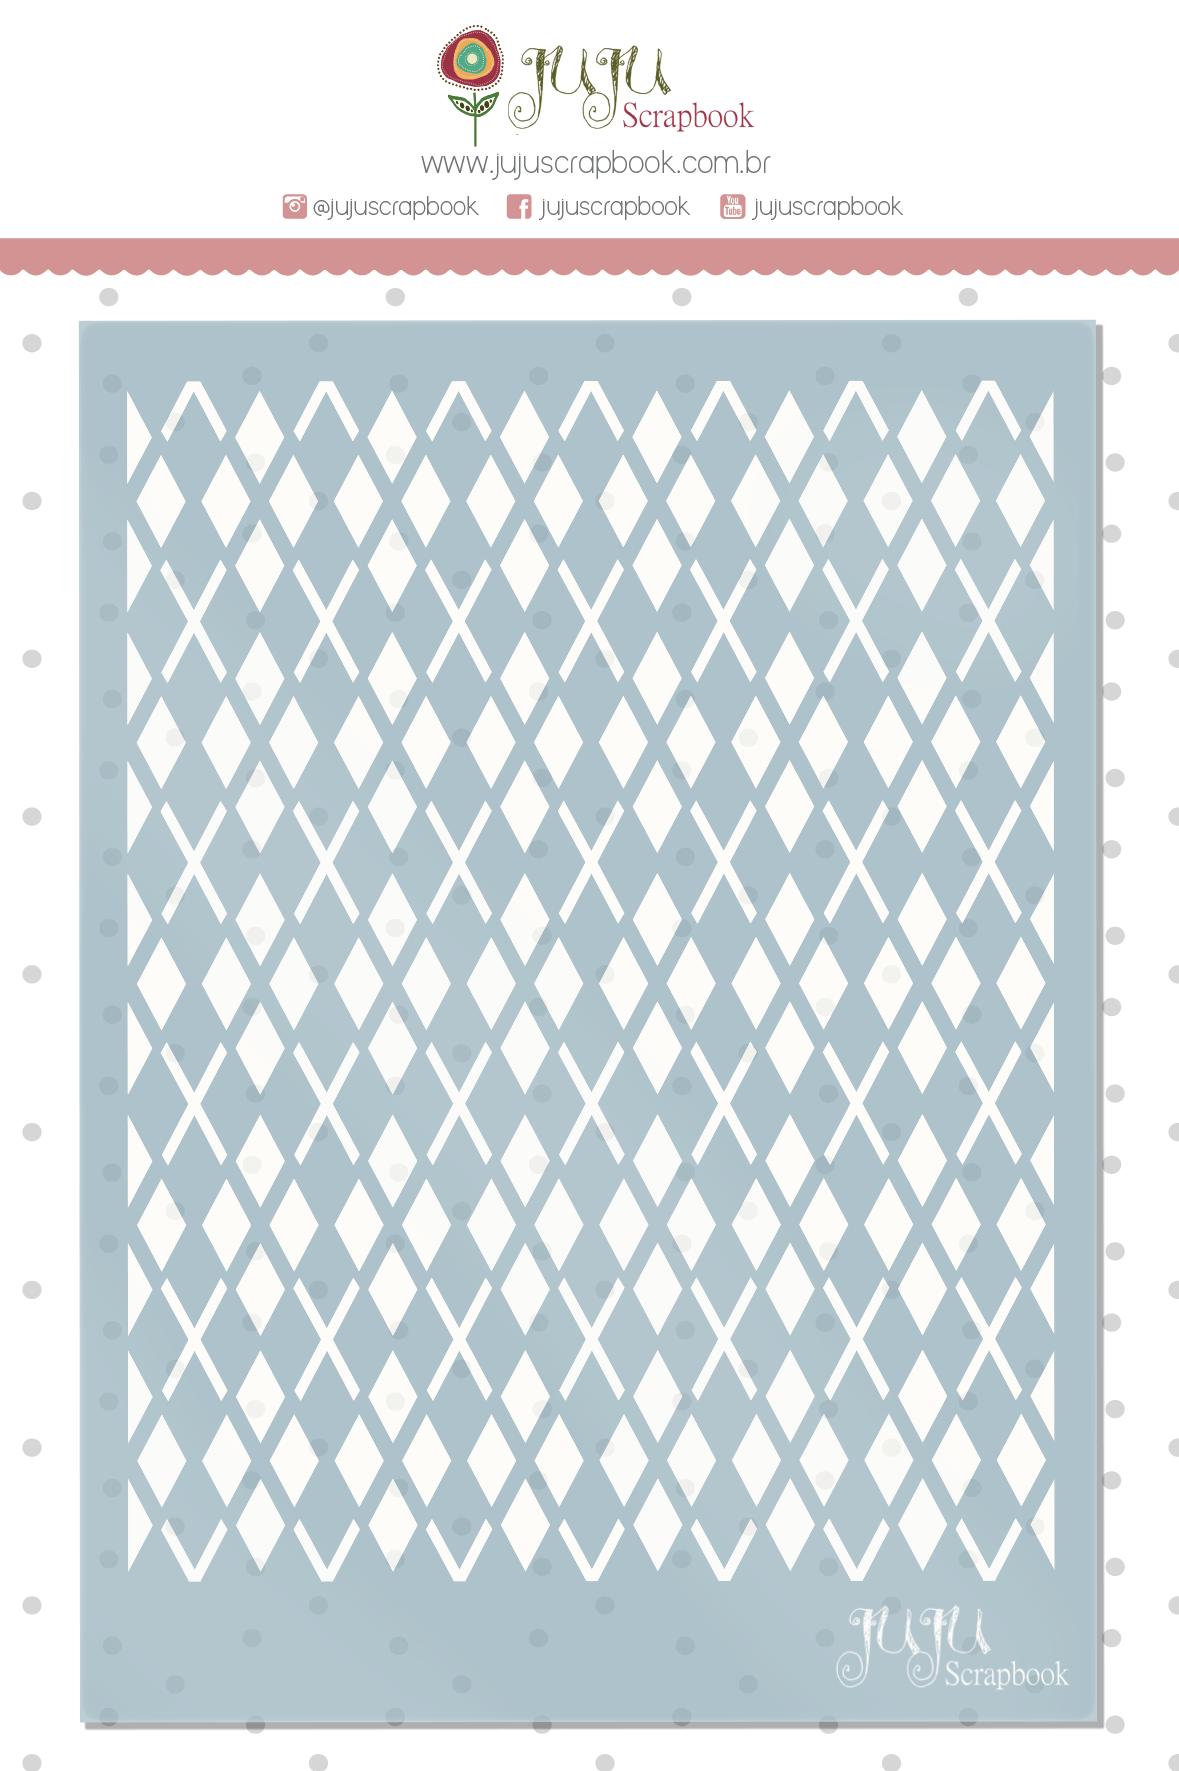 Stencil Xadrez - Coleção Família para Sempre - JuJu Scrapbook  - JuJu Scrapbook